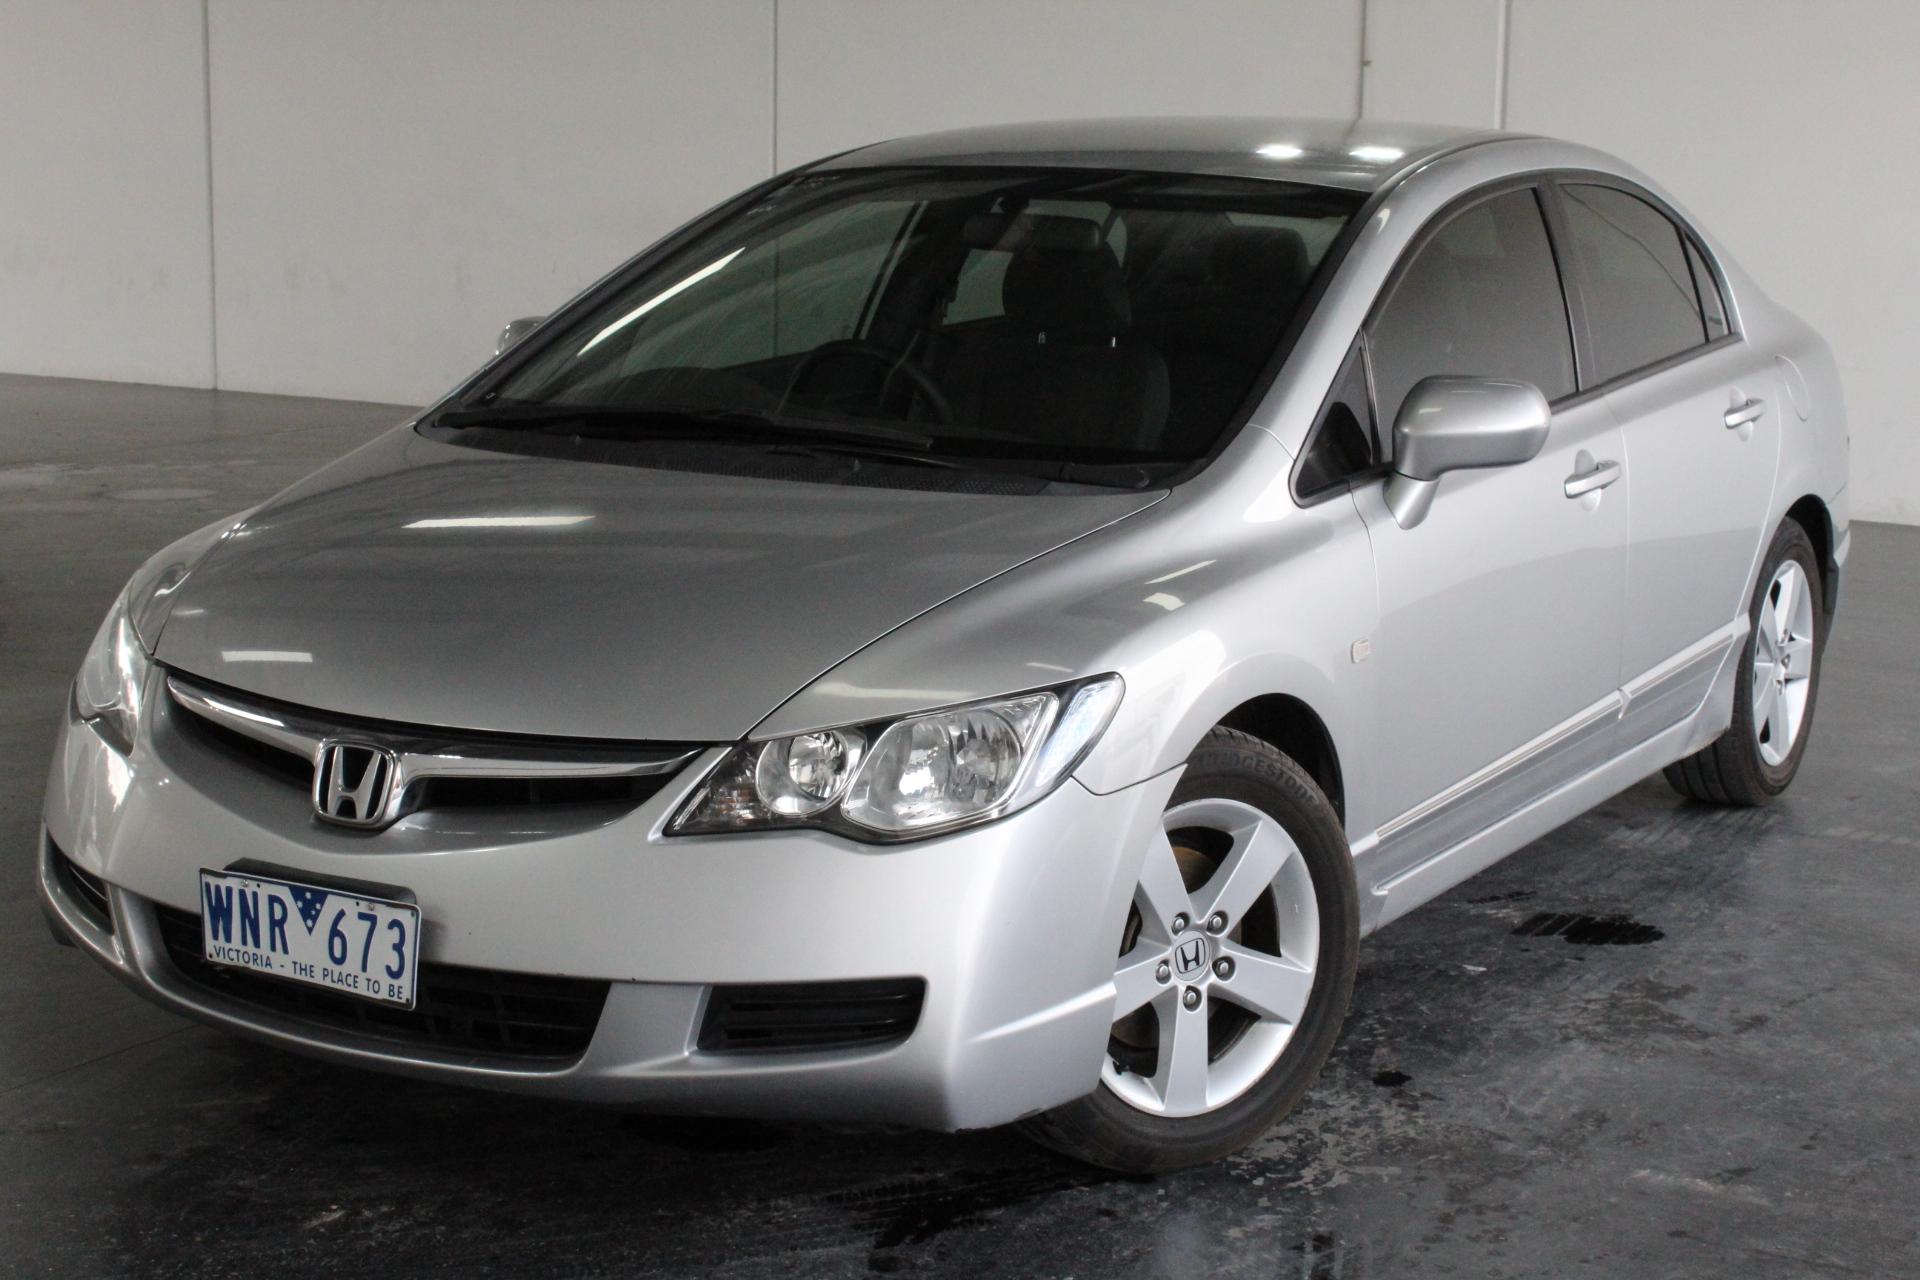 2008 Honda Civic VTi-L 8TH GEN Automatic Sedan